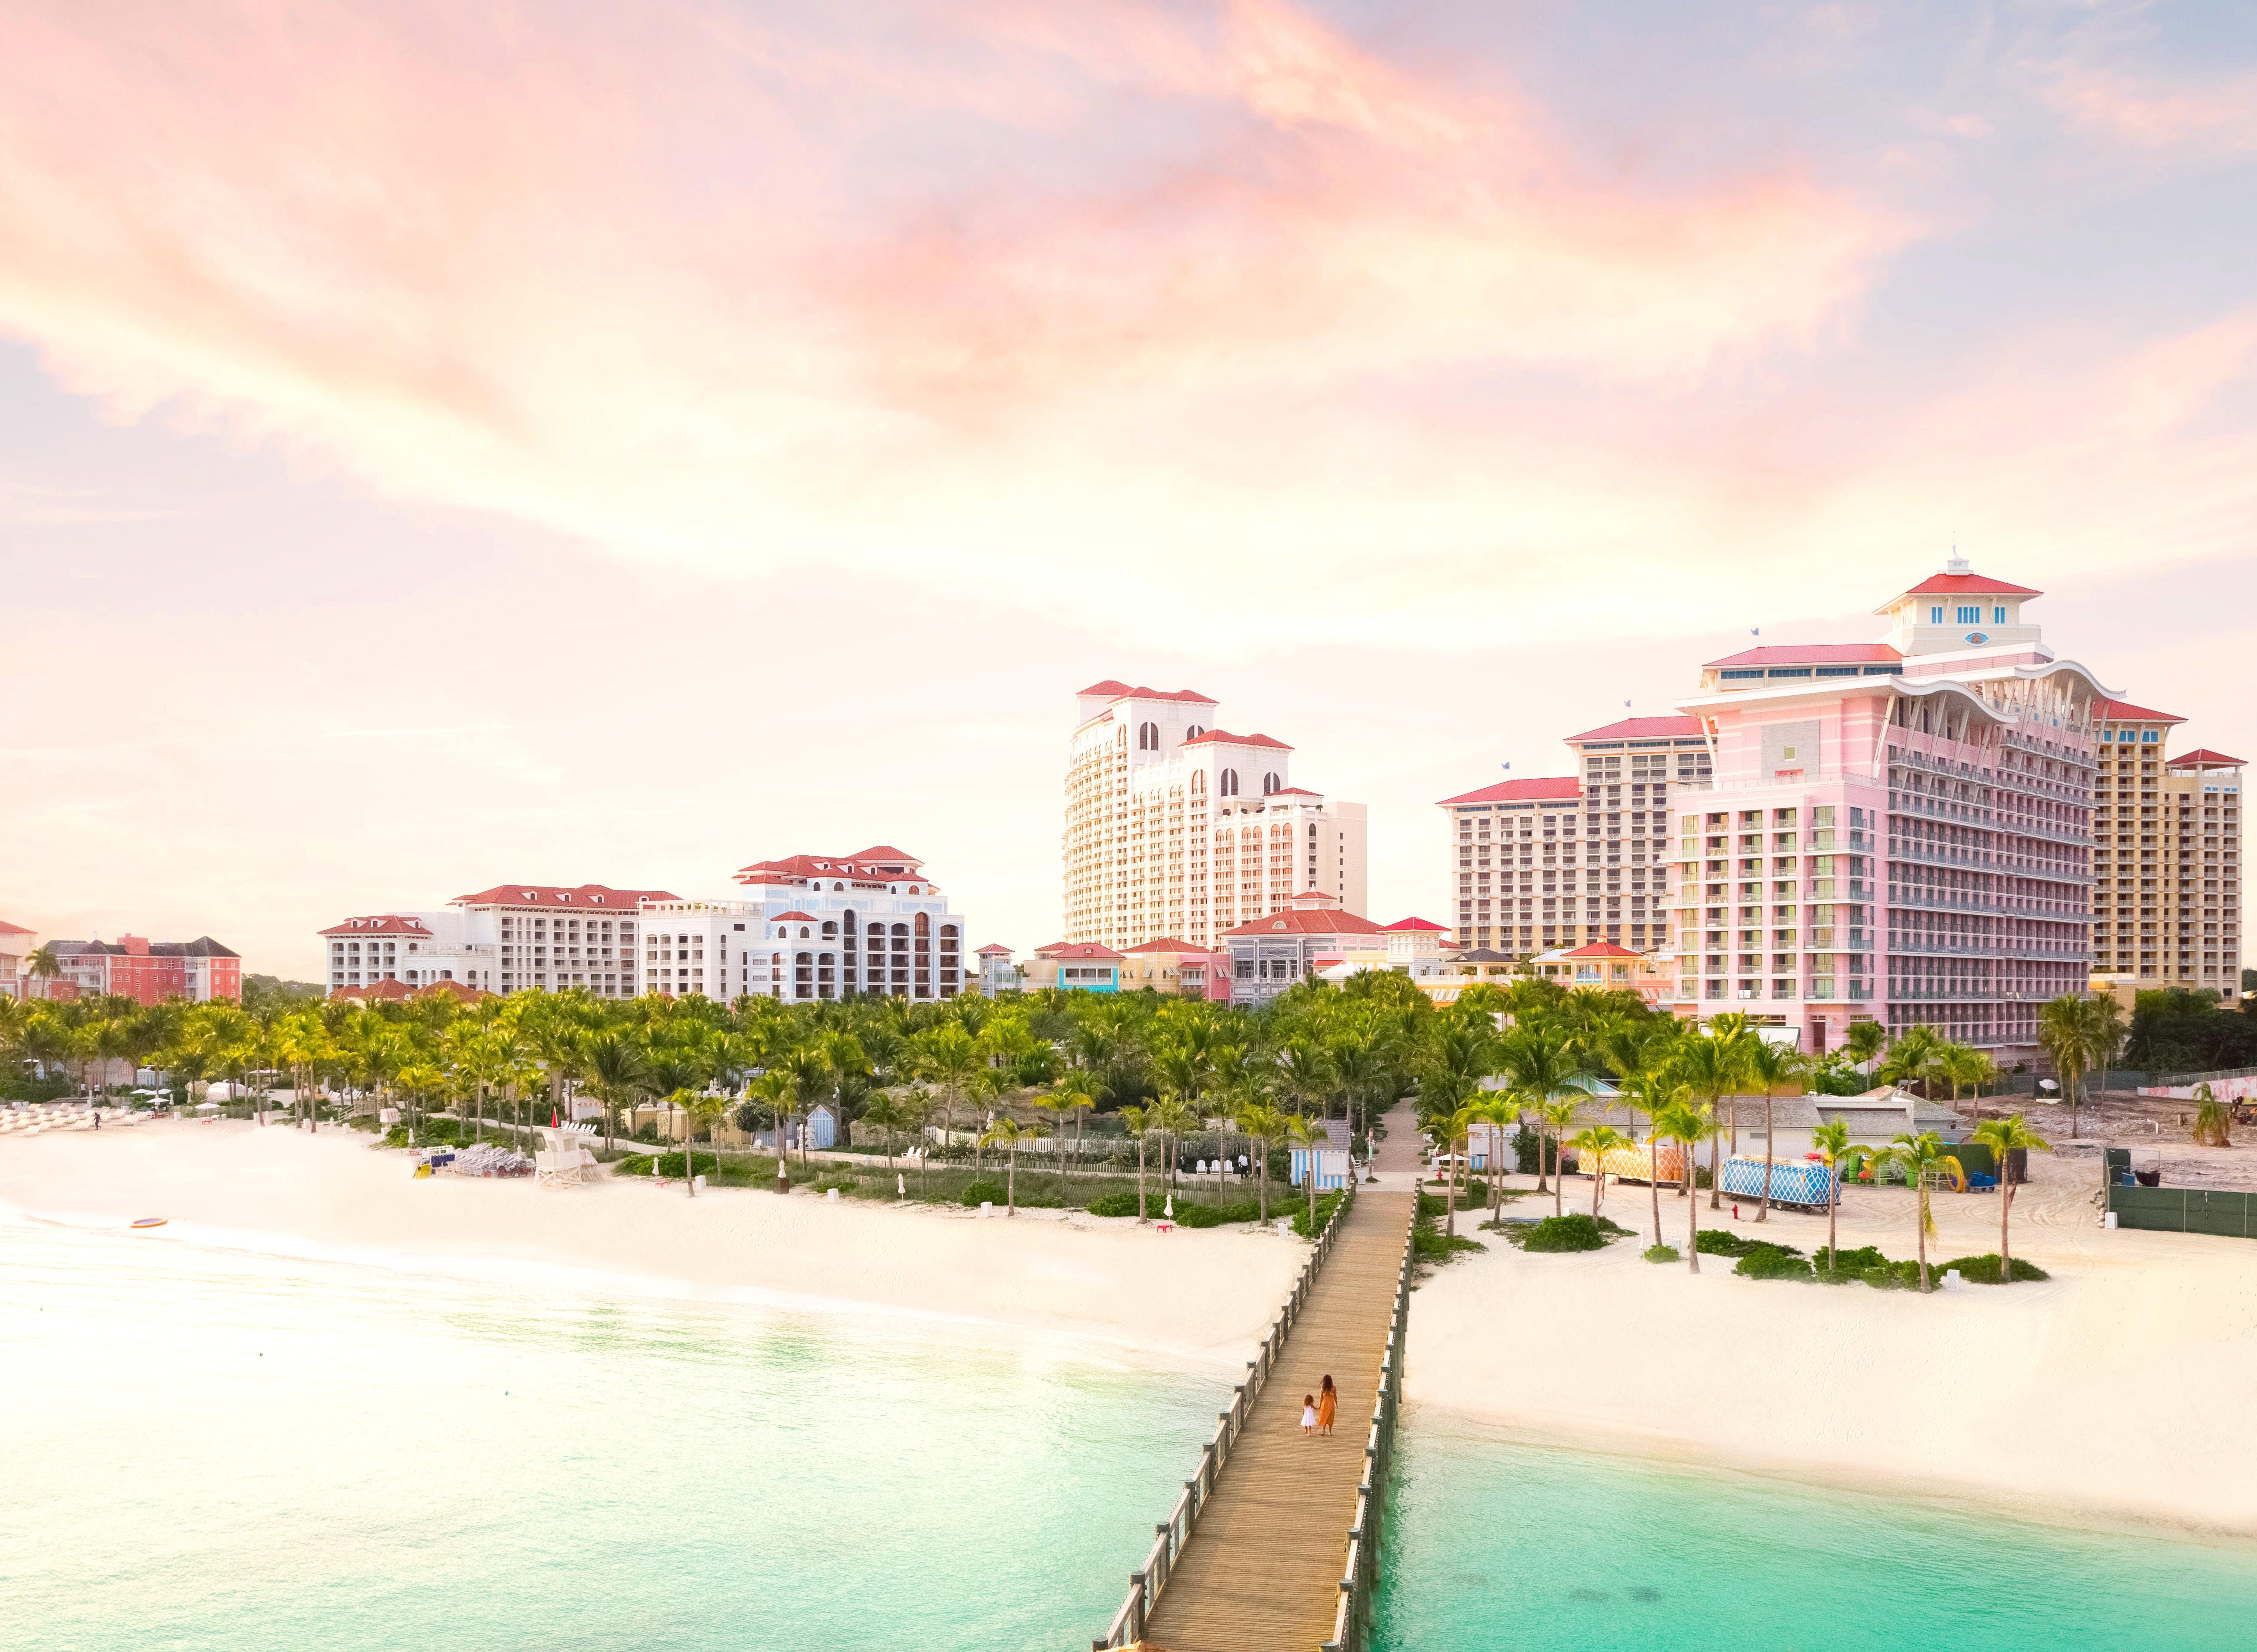 Baha Mar Resort destination's global hotel brands honored by condé nast traveler's Readers' Choice Awards 2019